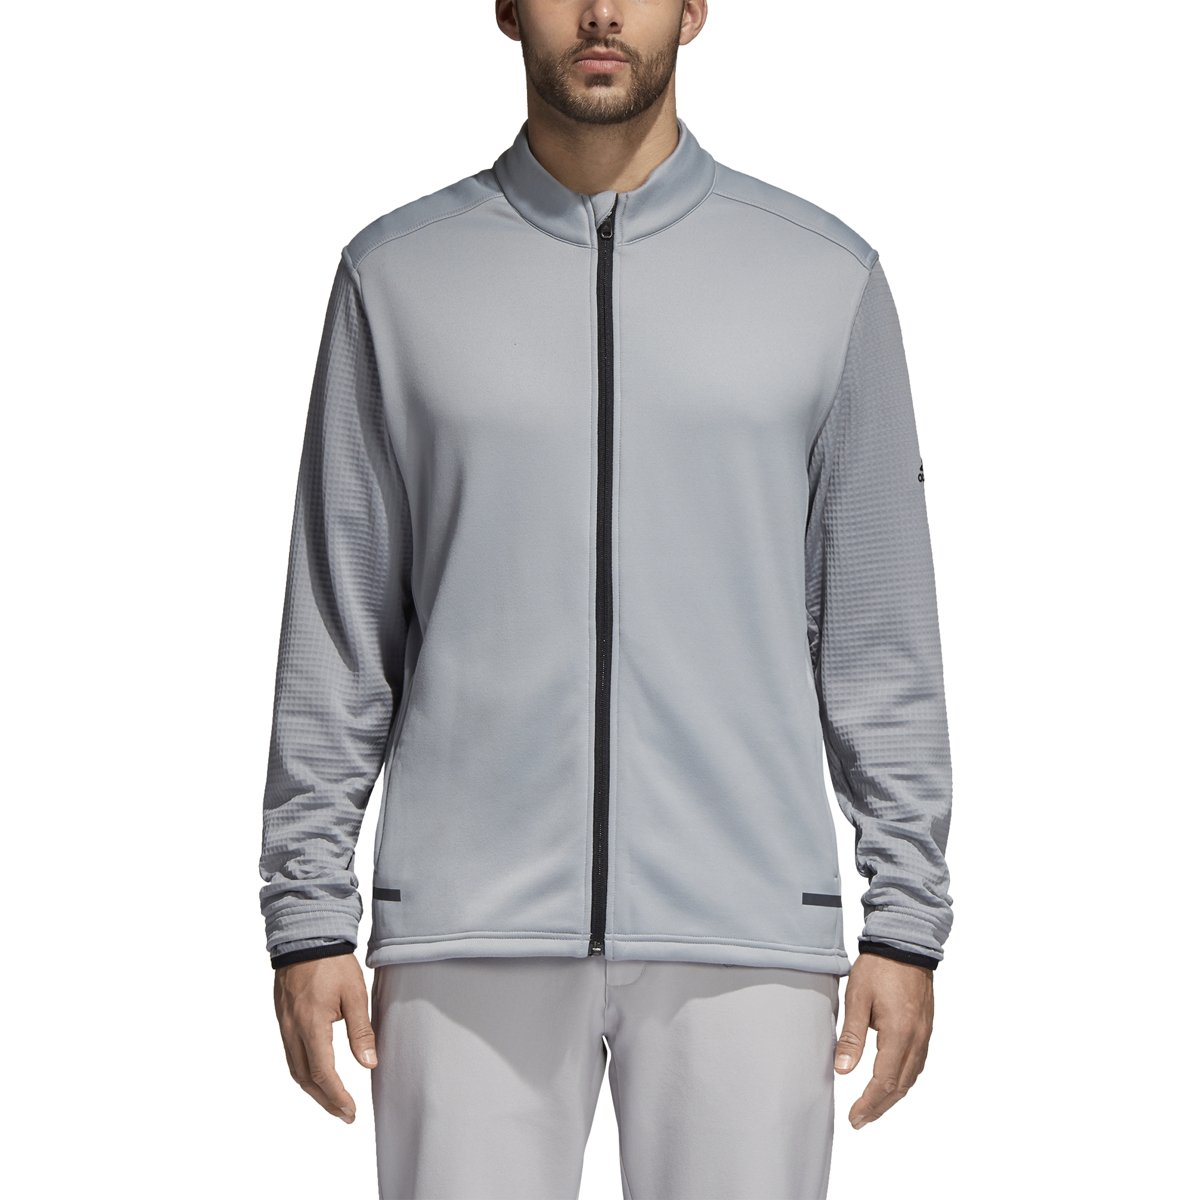 adidas Golf Men's Golf Climaheat Hybrid Full Zip Jacket, Mid Grey, Large by adidas